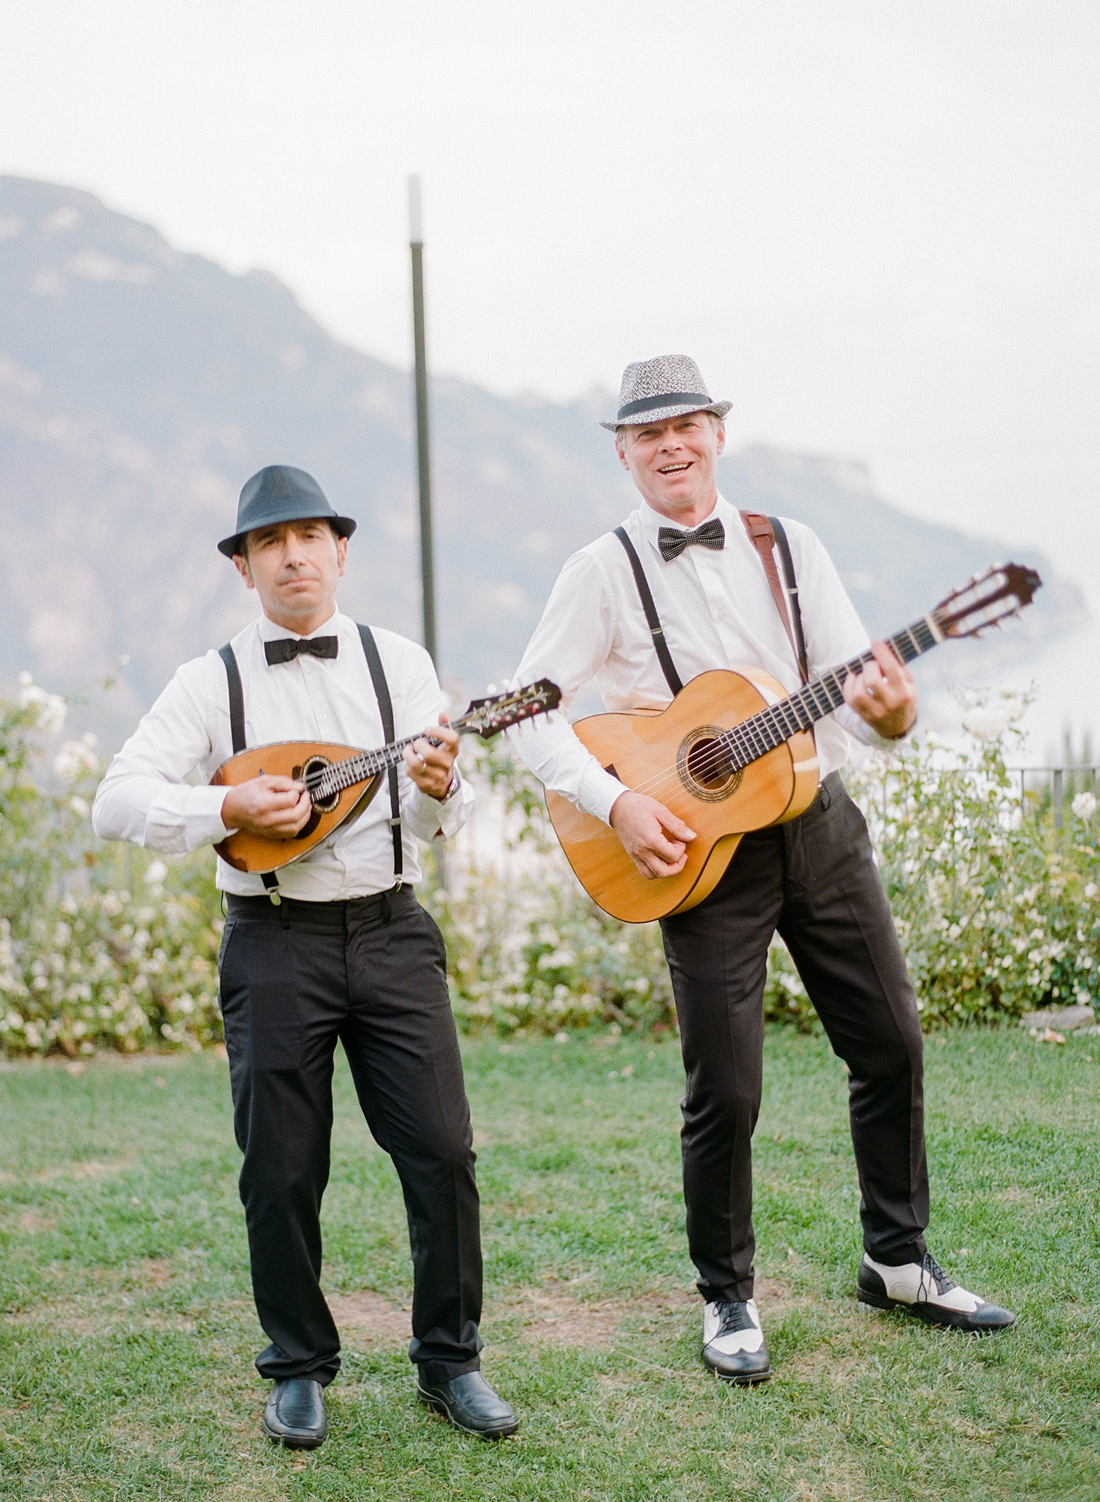 Italian musicians wearing bowties and suspenders